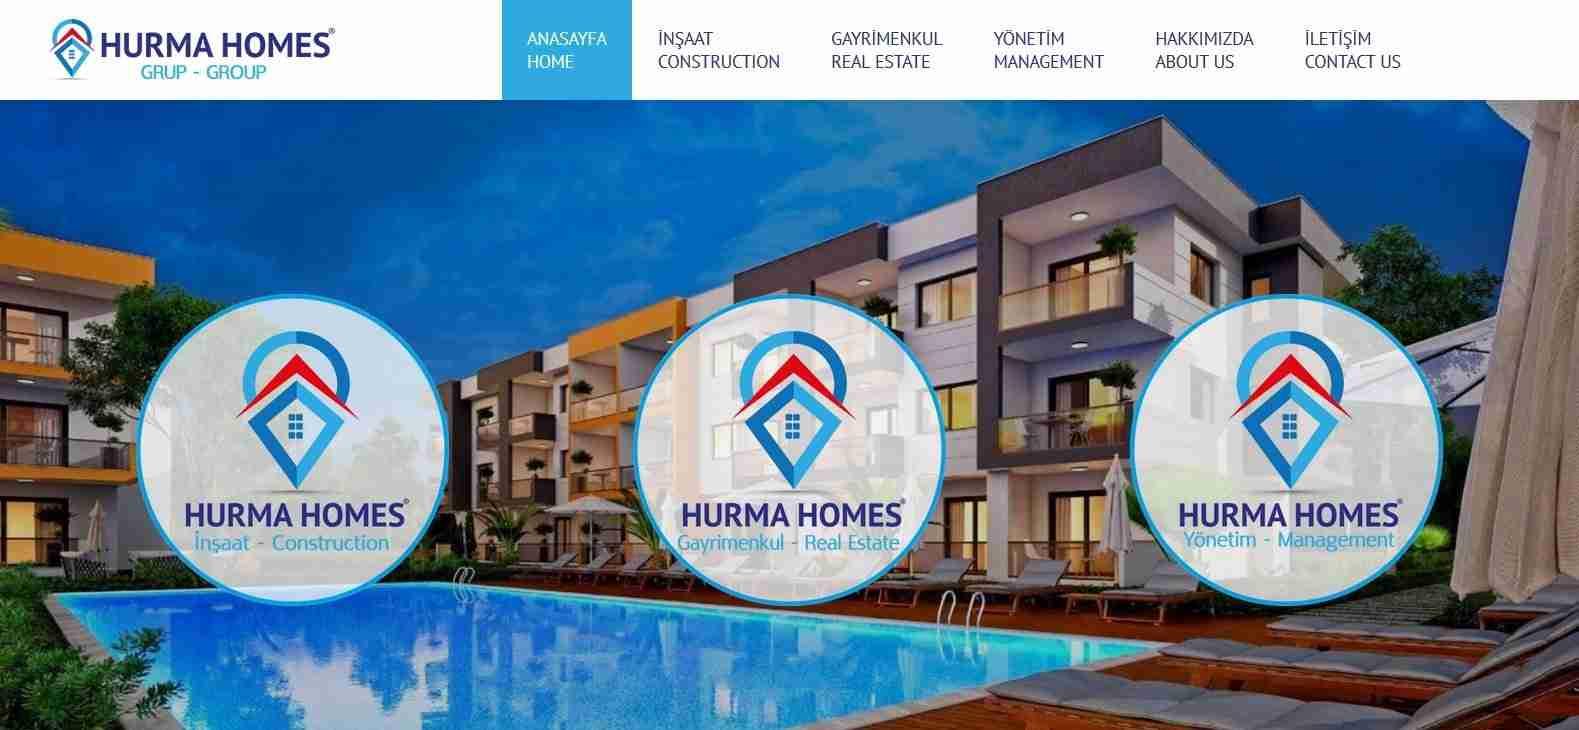 hurmahomes website